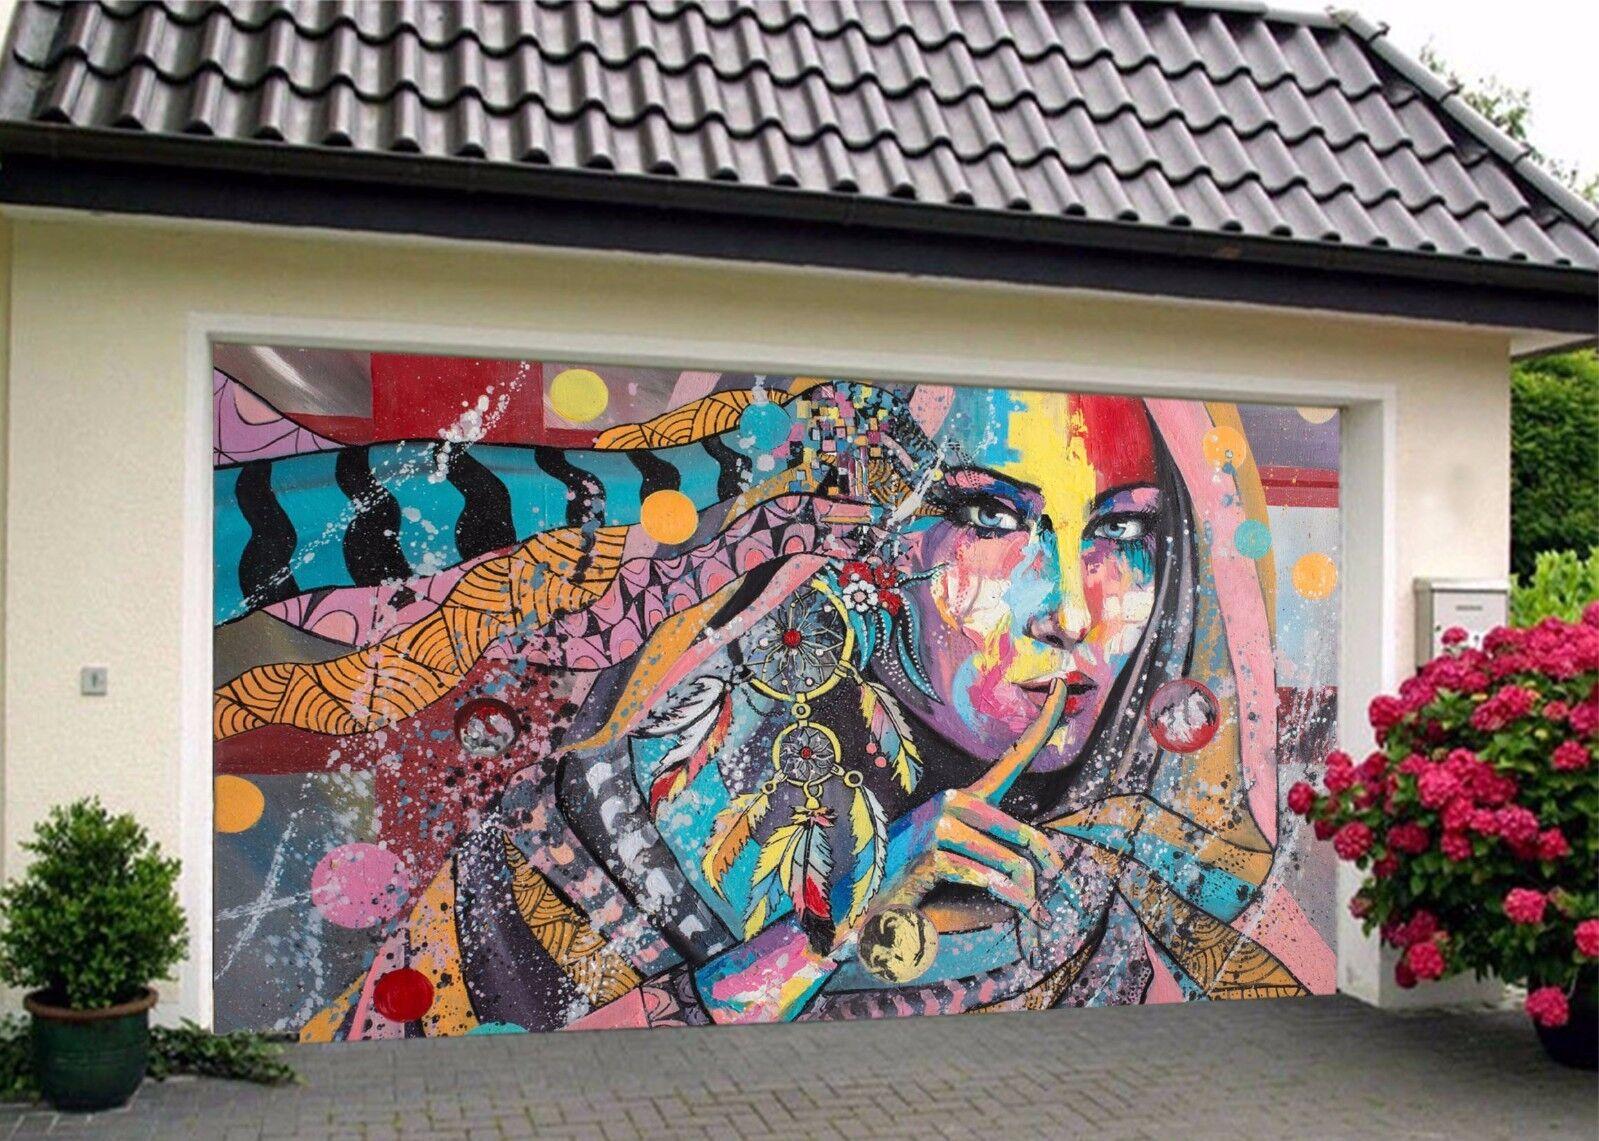 3D Earring Female 57 Garage Door Murals Wall Print Wall AJ WALLPAPER UK Lemon